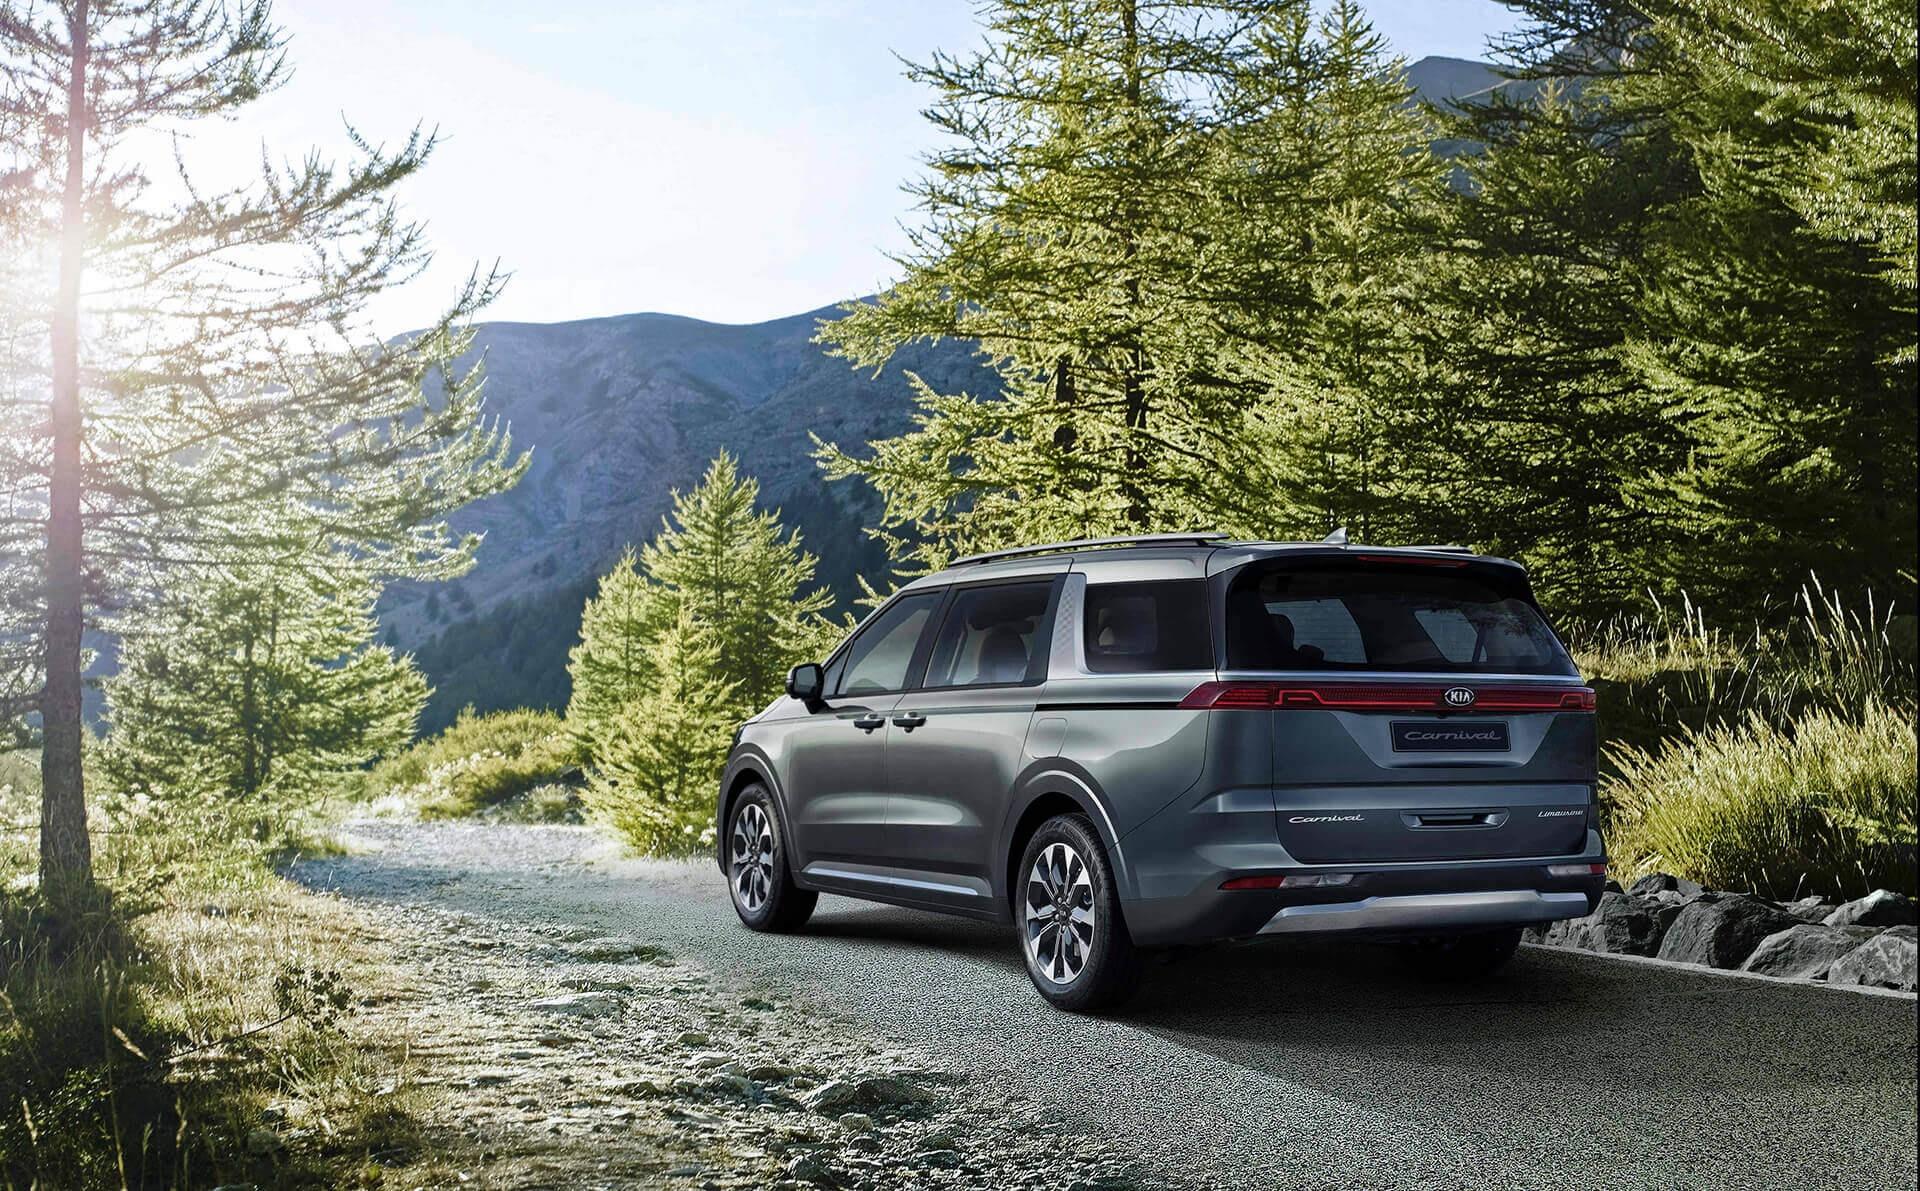 SUV-Inspired Design Extends Rearwards